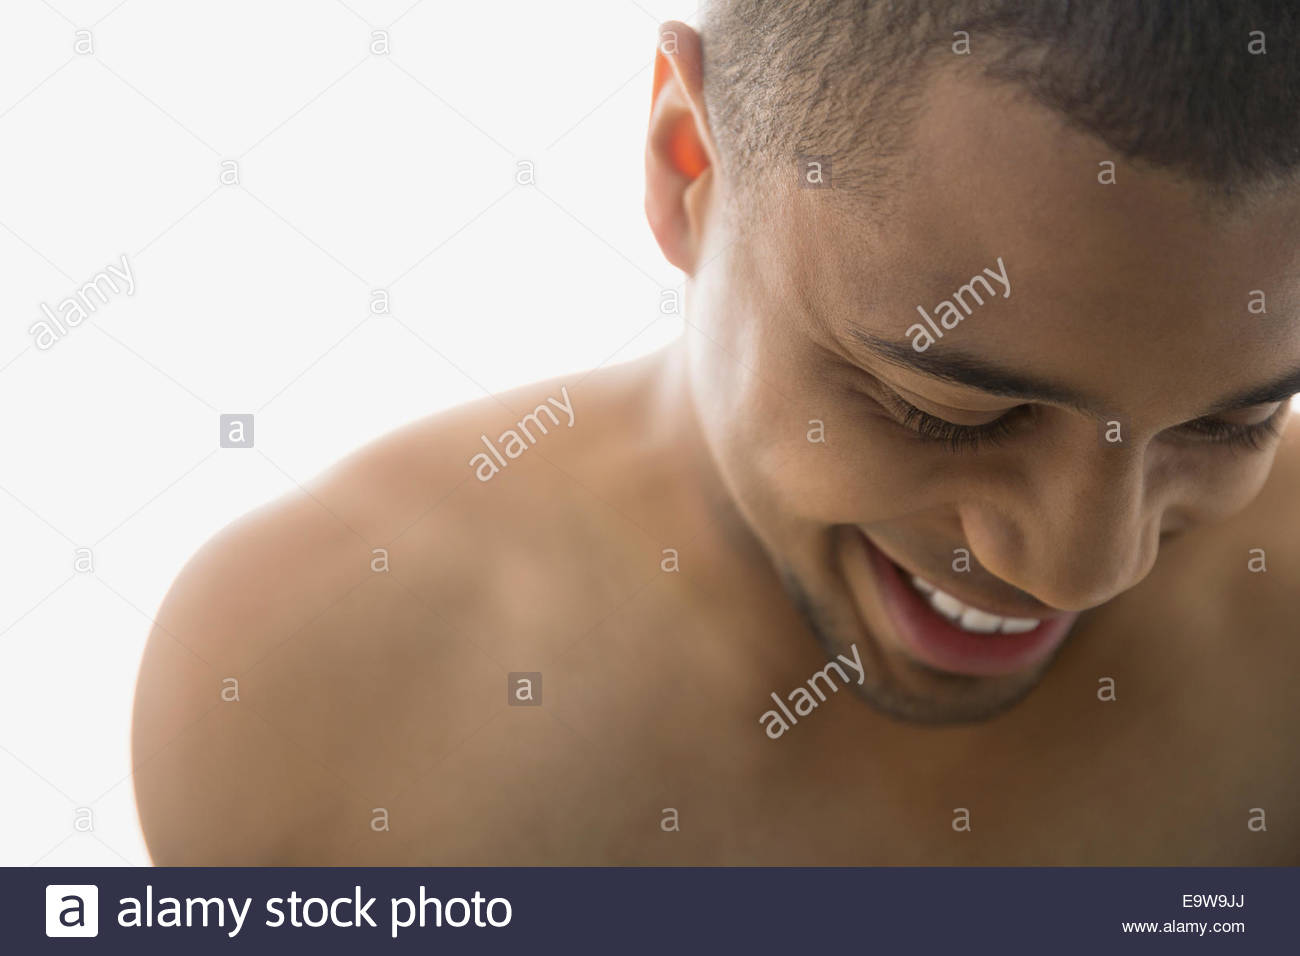 Cerca de bare chested hombre mirando hacia abajo Imagen De Stock